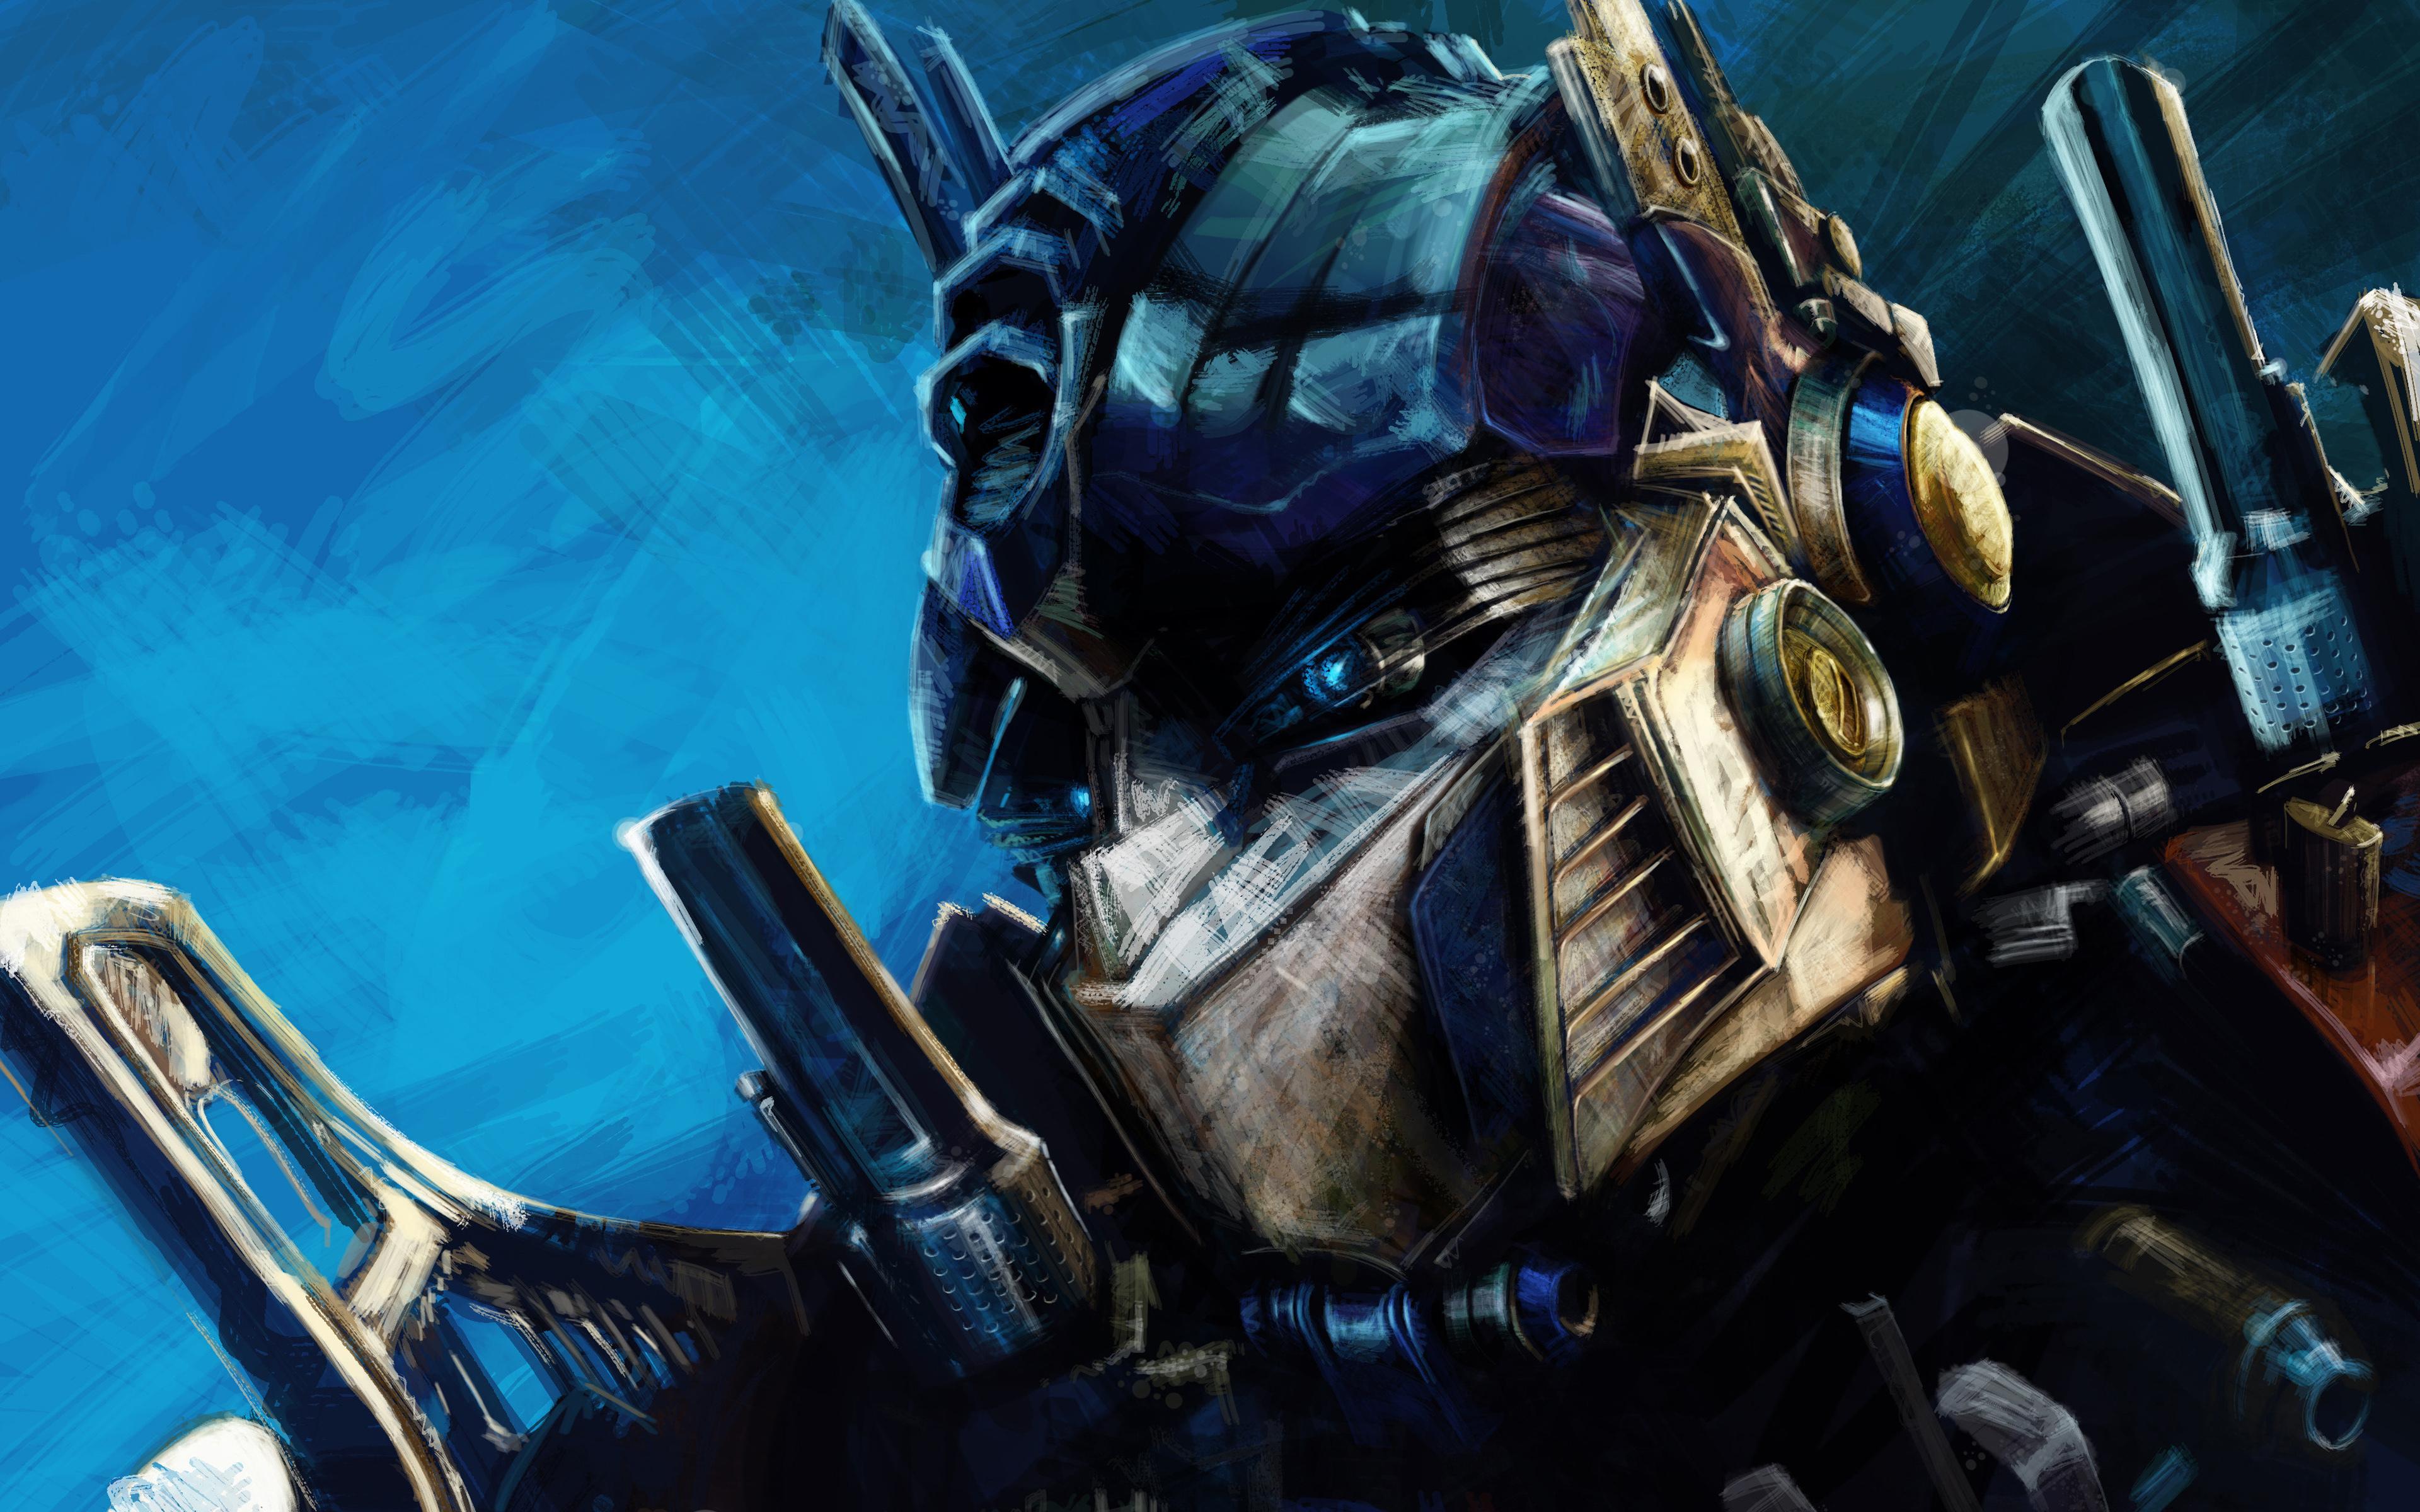 Image: Optimus Prime, Transformers, art, head, robot, leader, autobots